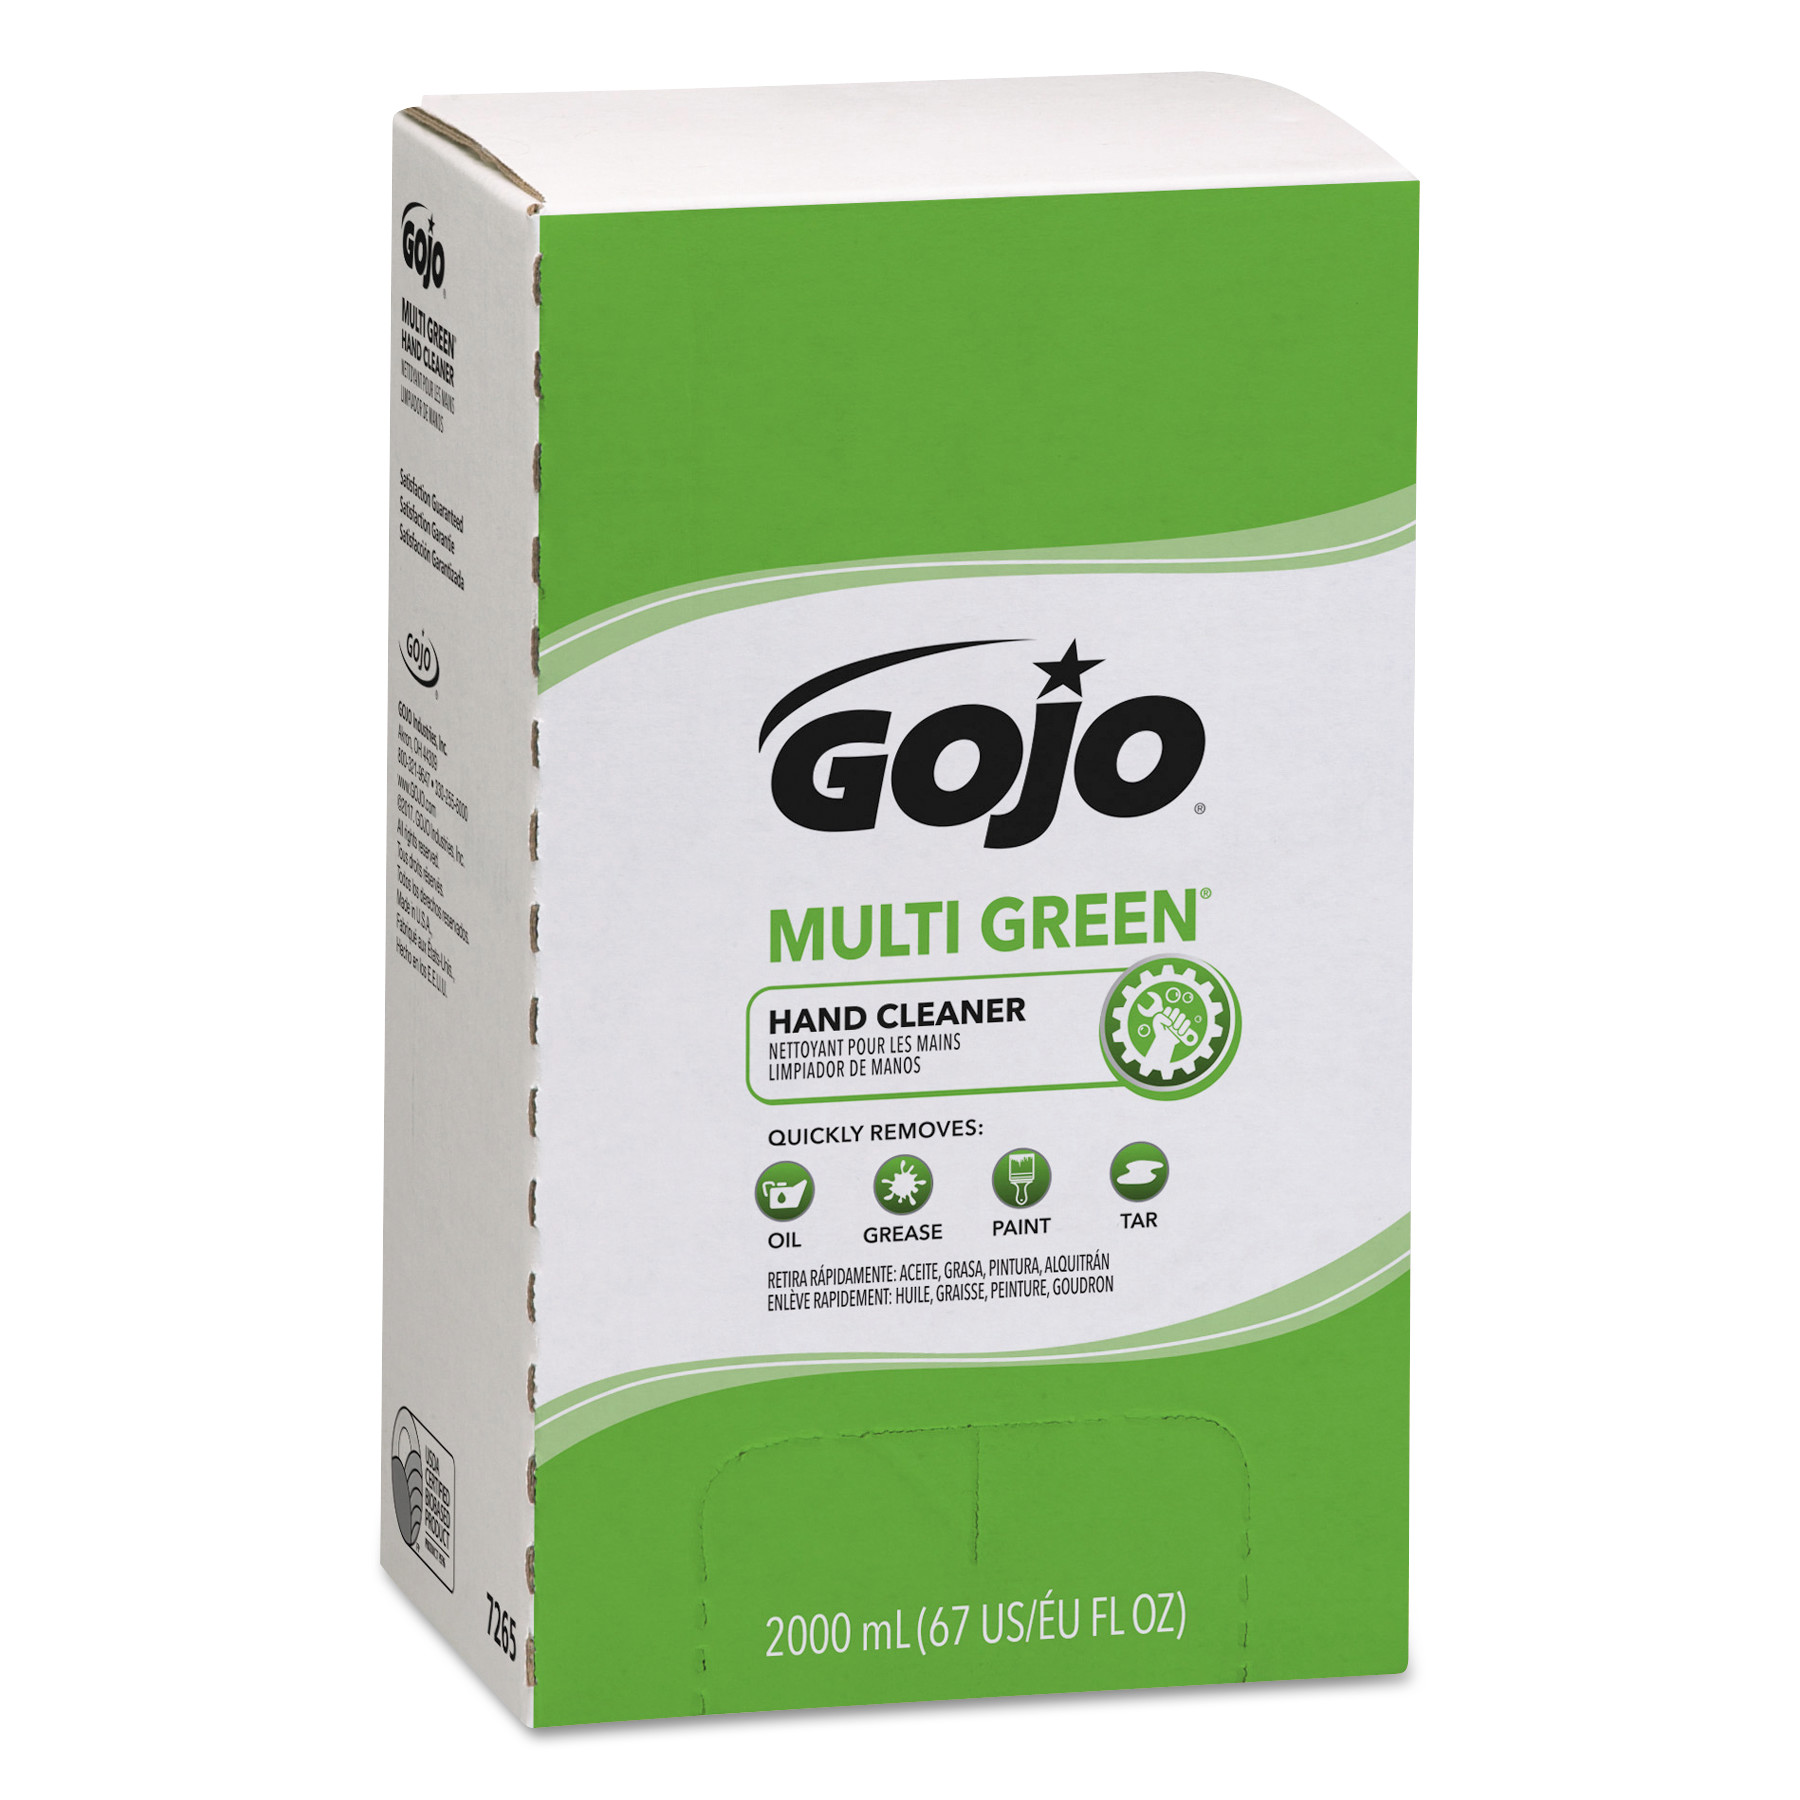 MULTI GREEN Hand Cleaner Refill, 2000mL, Citrus Scent, Green, 4/Carton